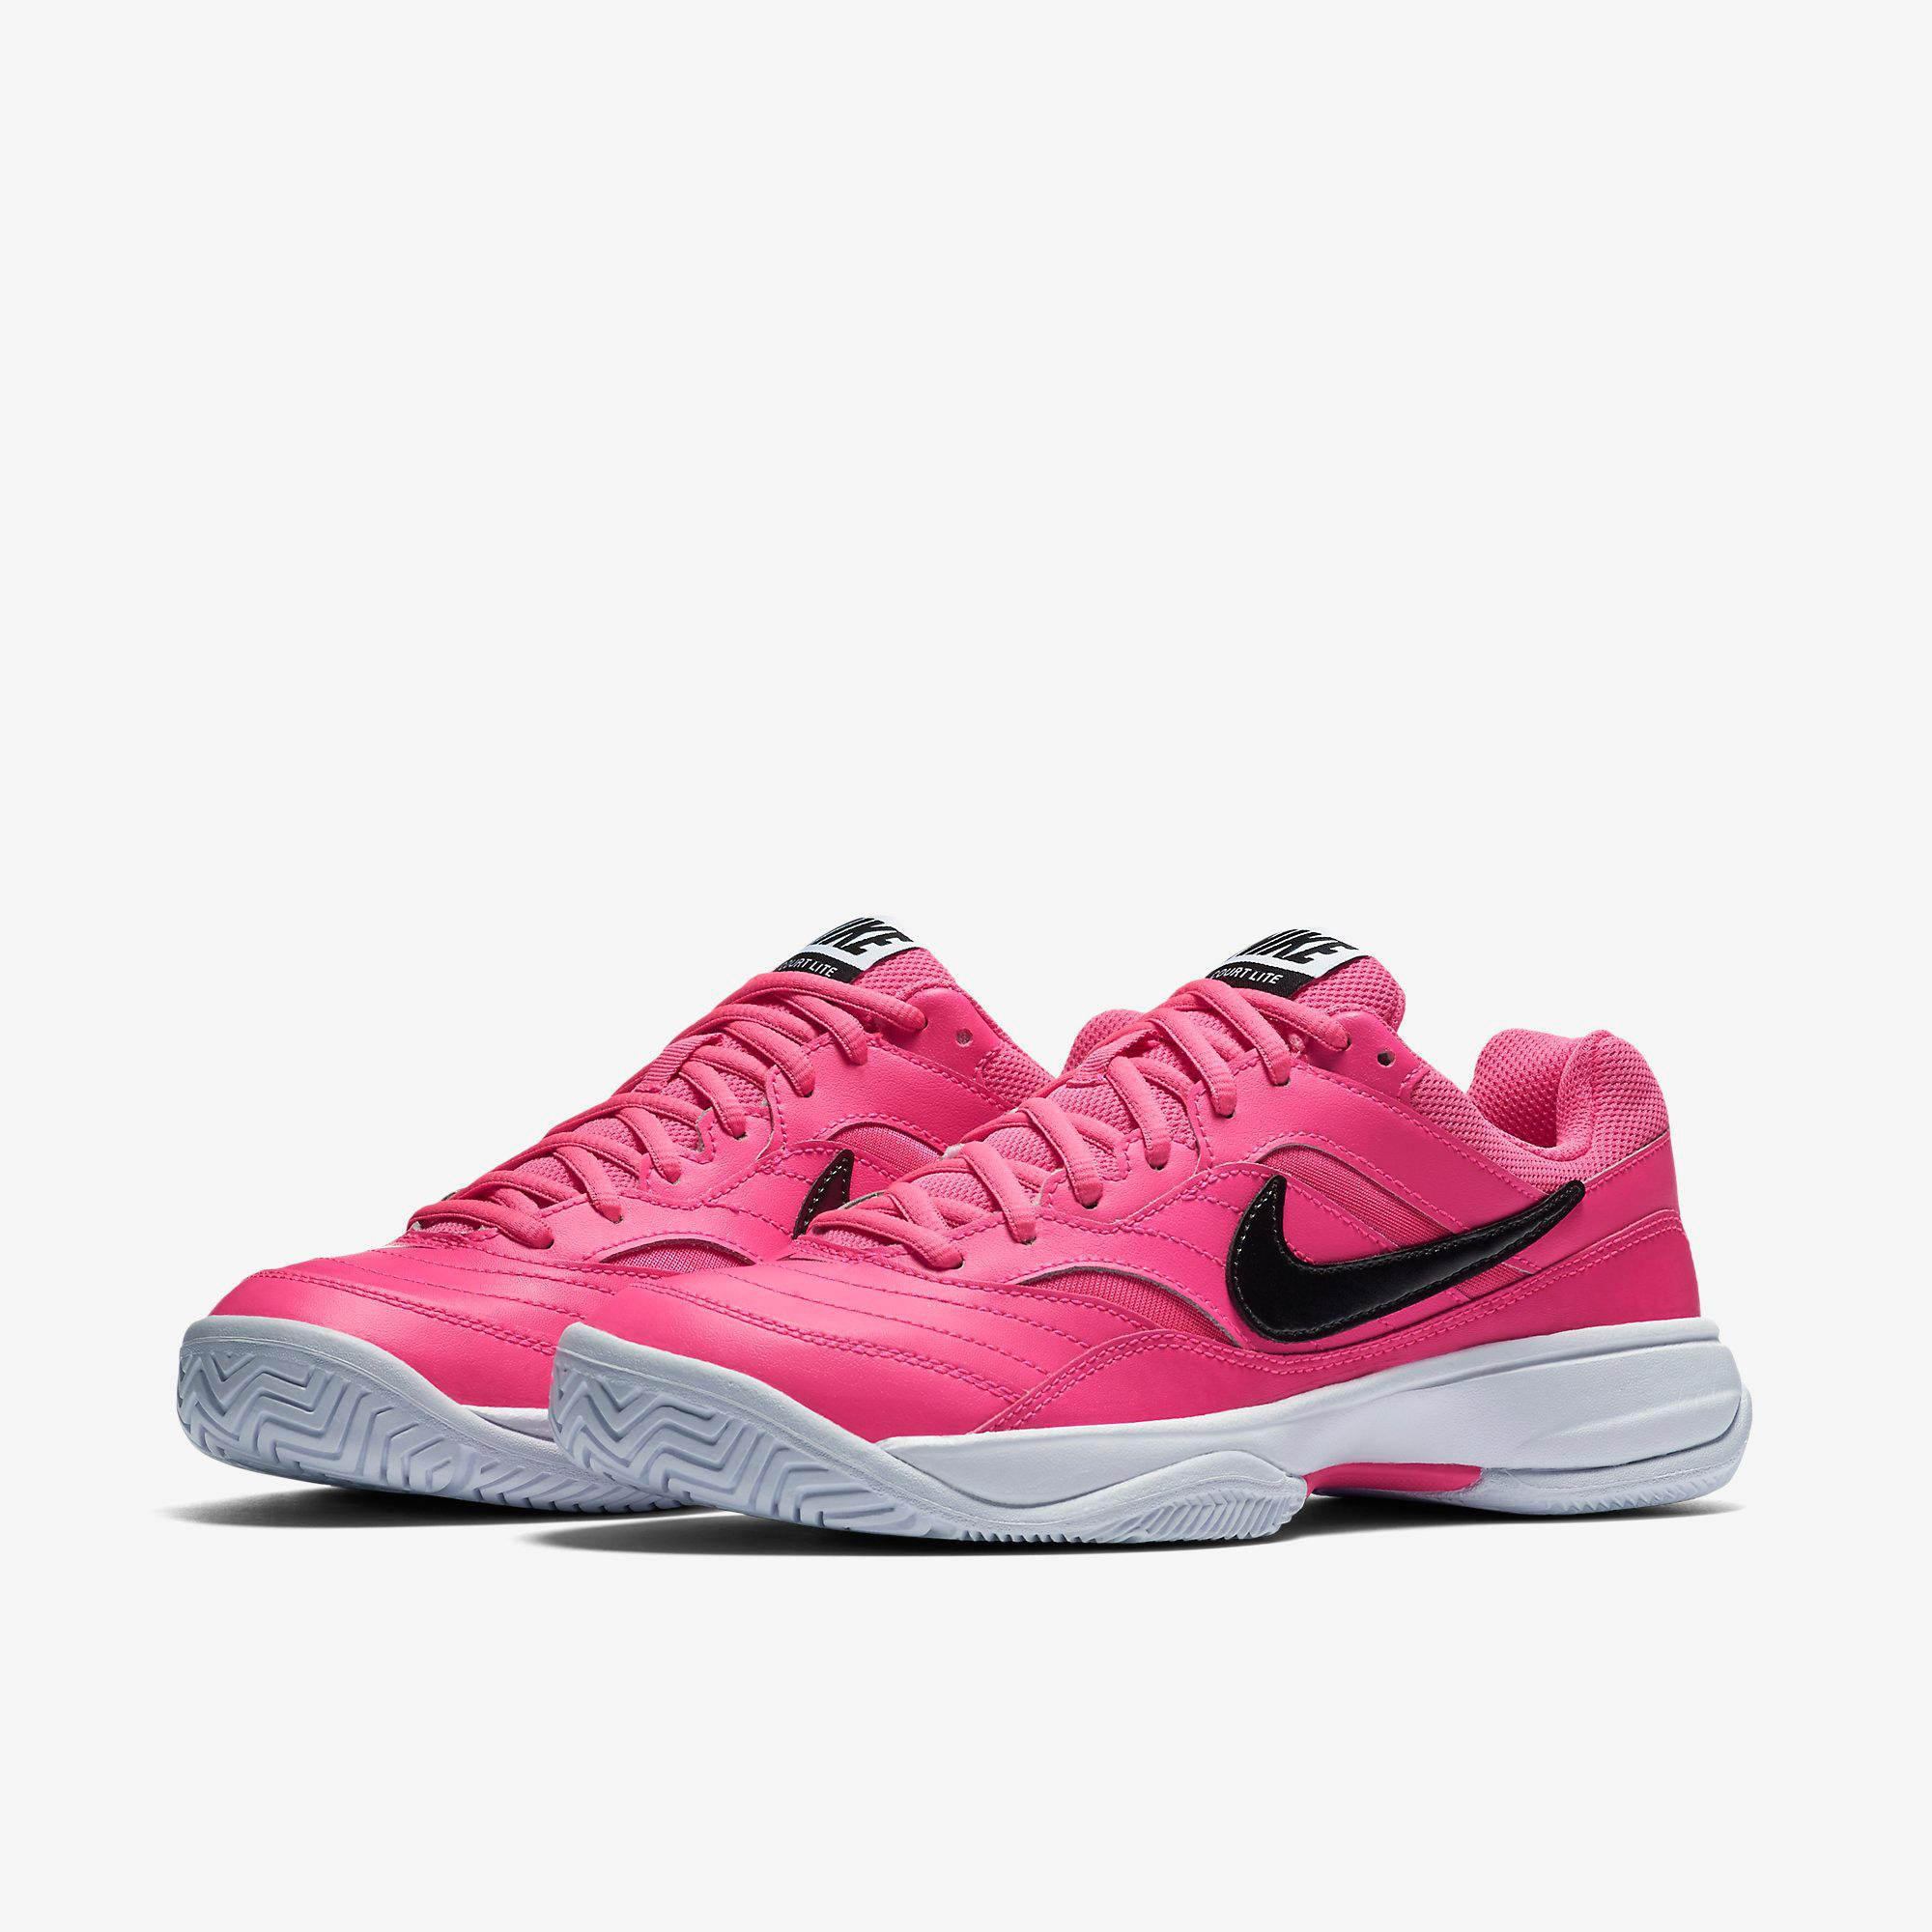 nike womens court lite tennis shoes pink blast black